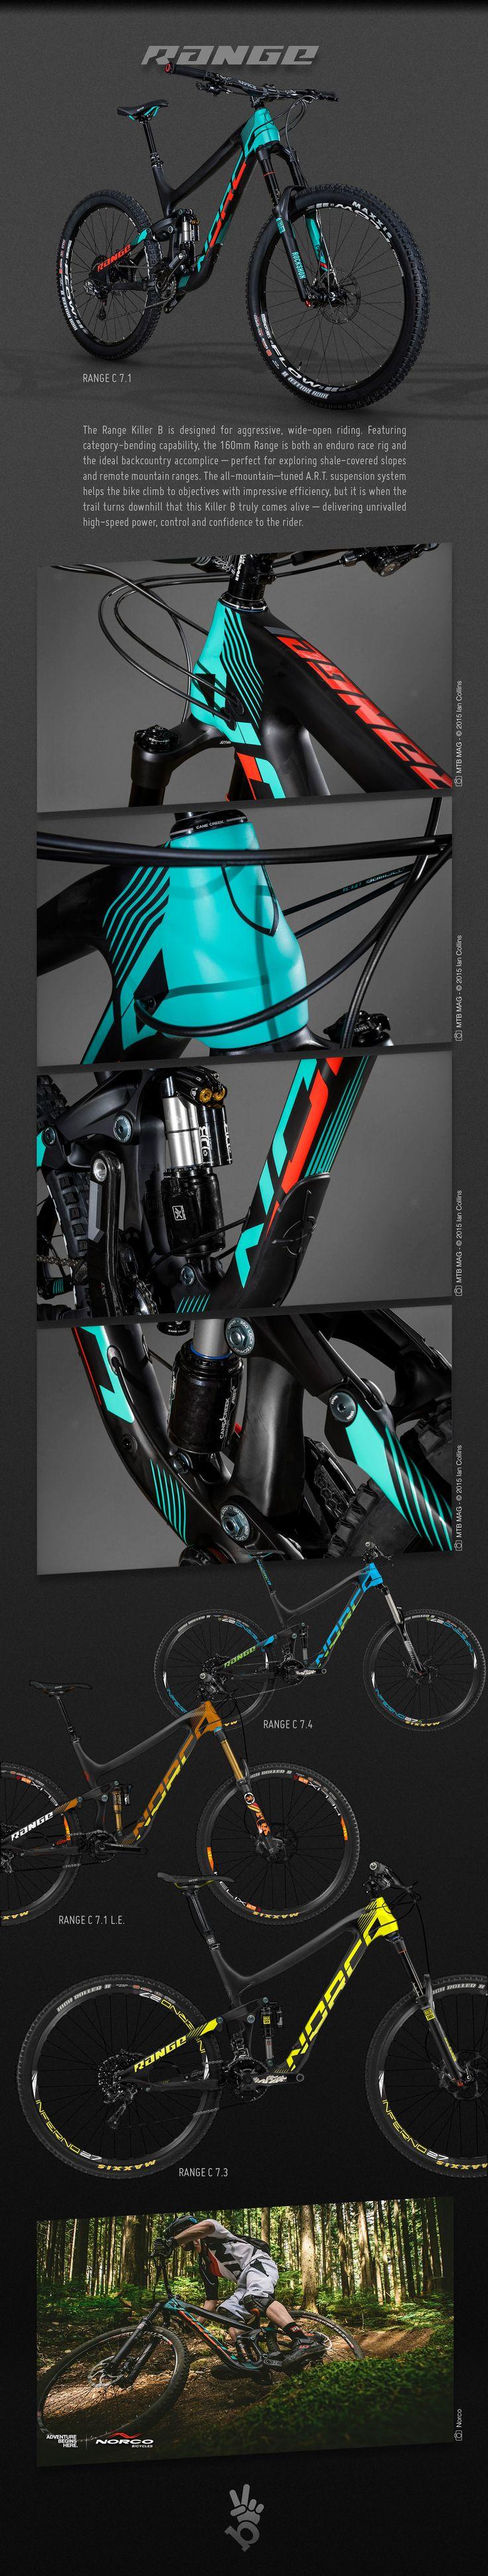 2015 Norco Range C bicycle graphics on Behance